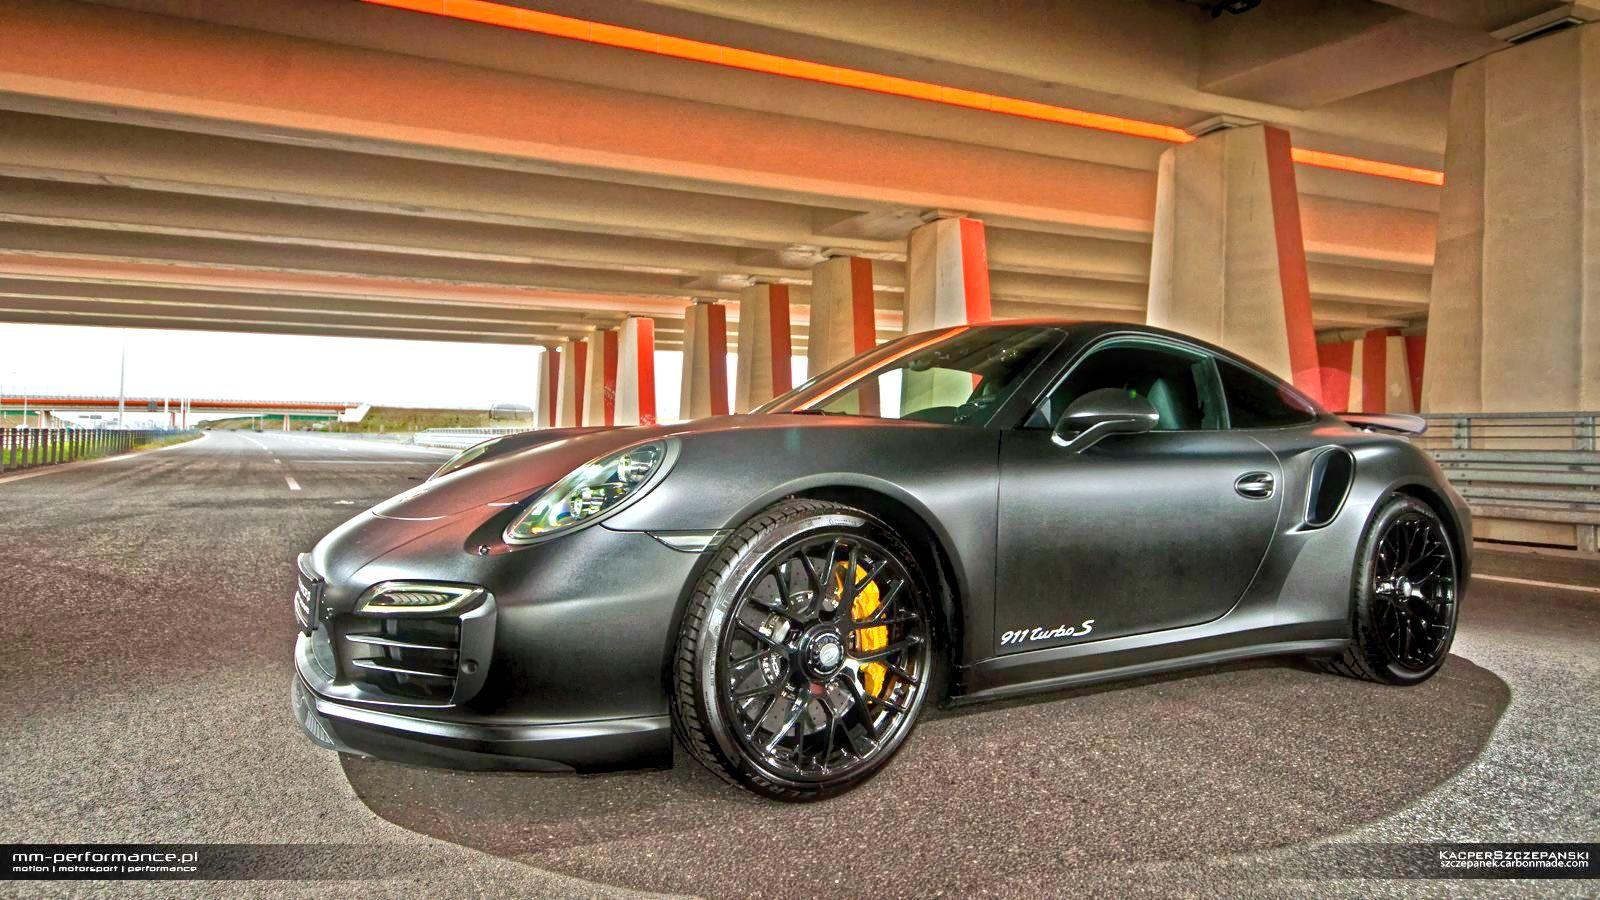 Porsche Turbo S Porsche 911 Turbo Porsche 911 Turbo S